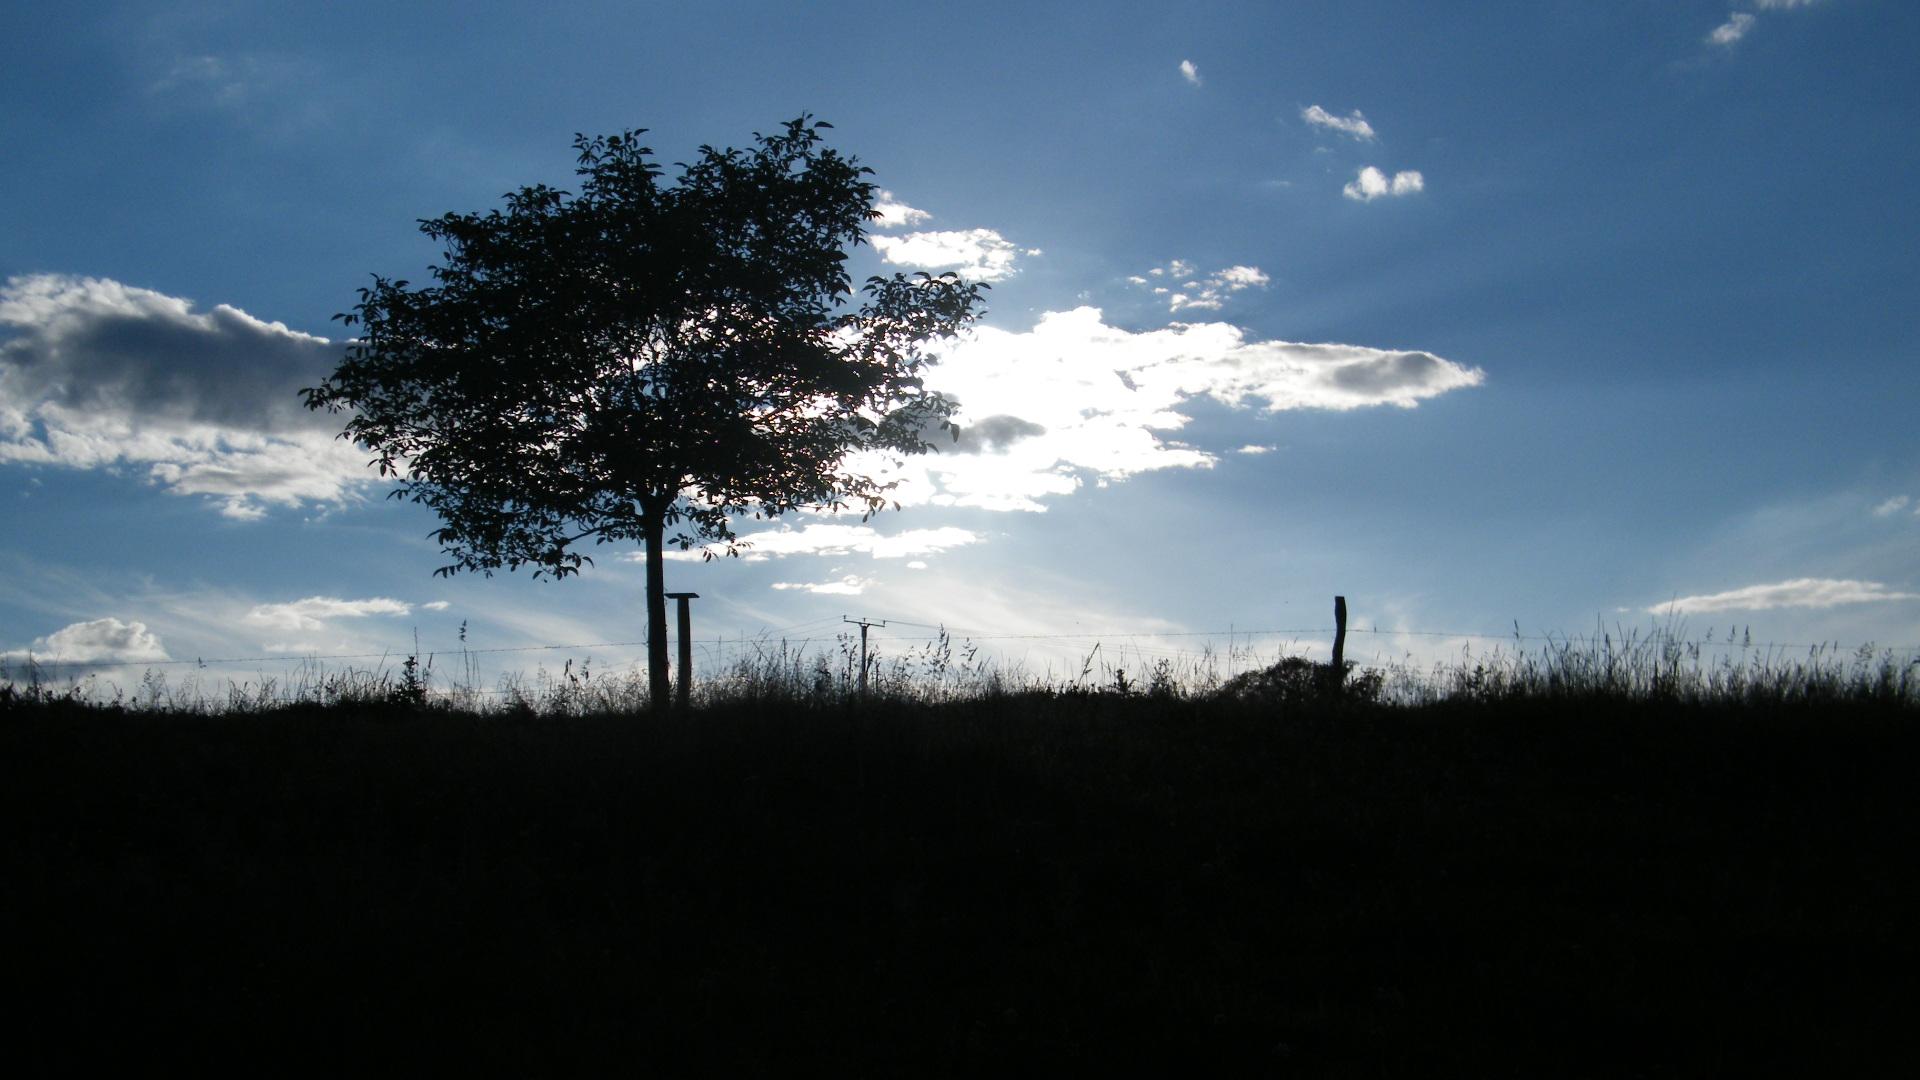 Blue Sky & Black Tree